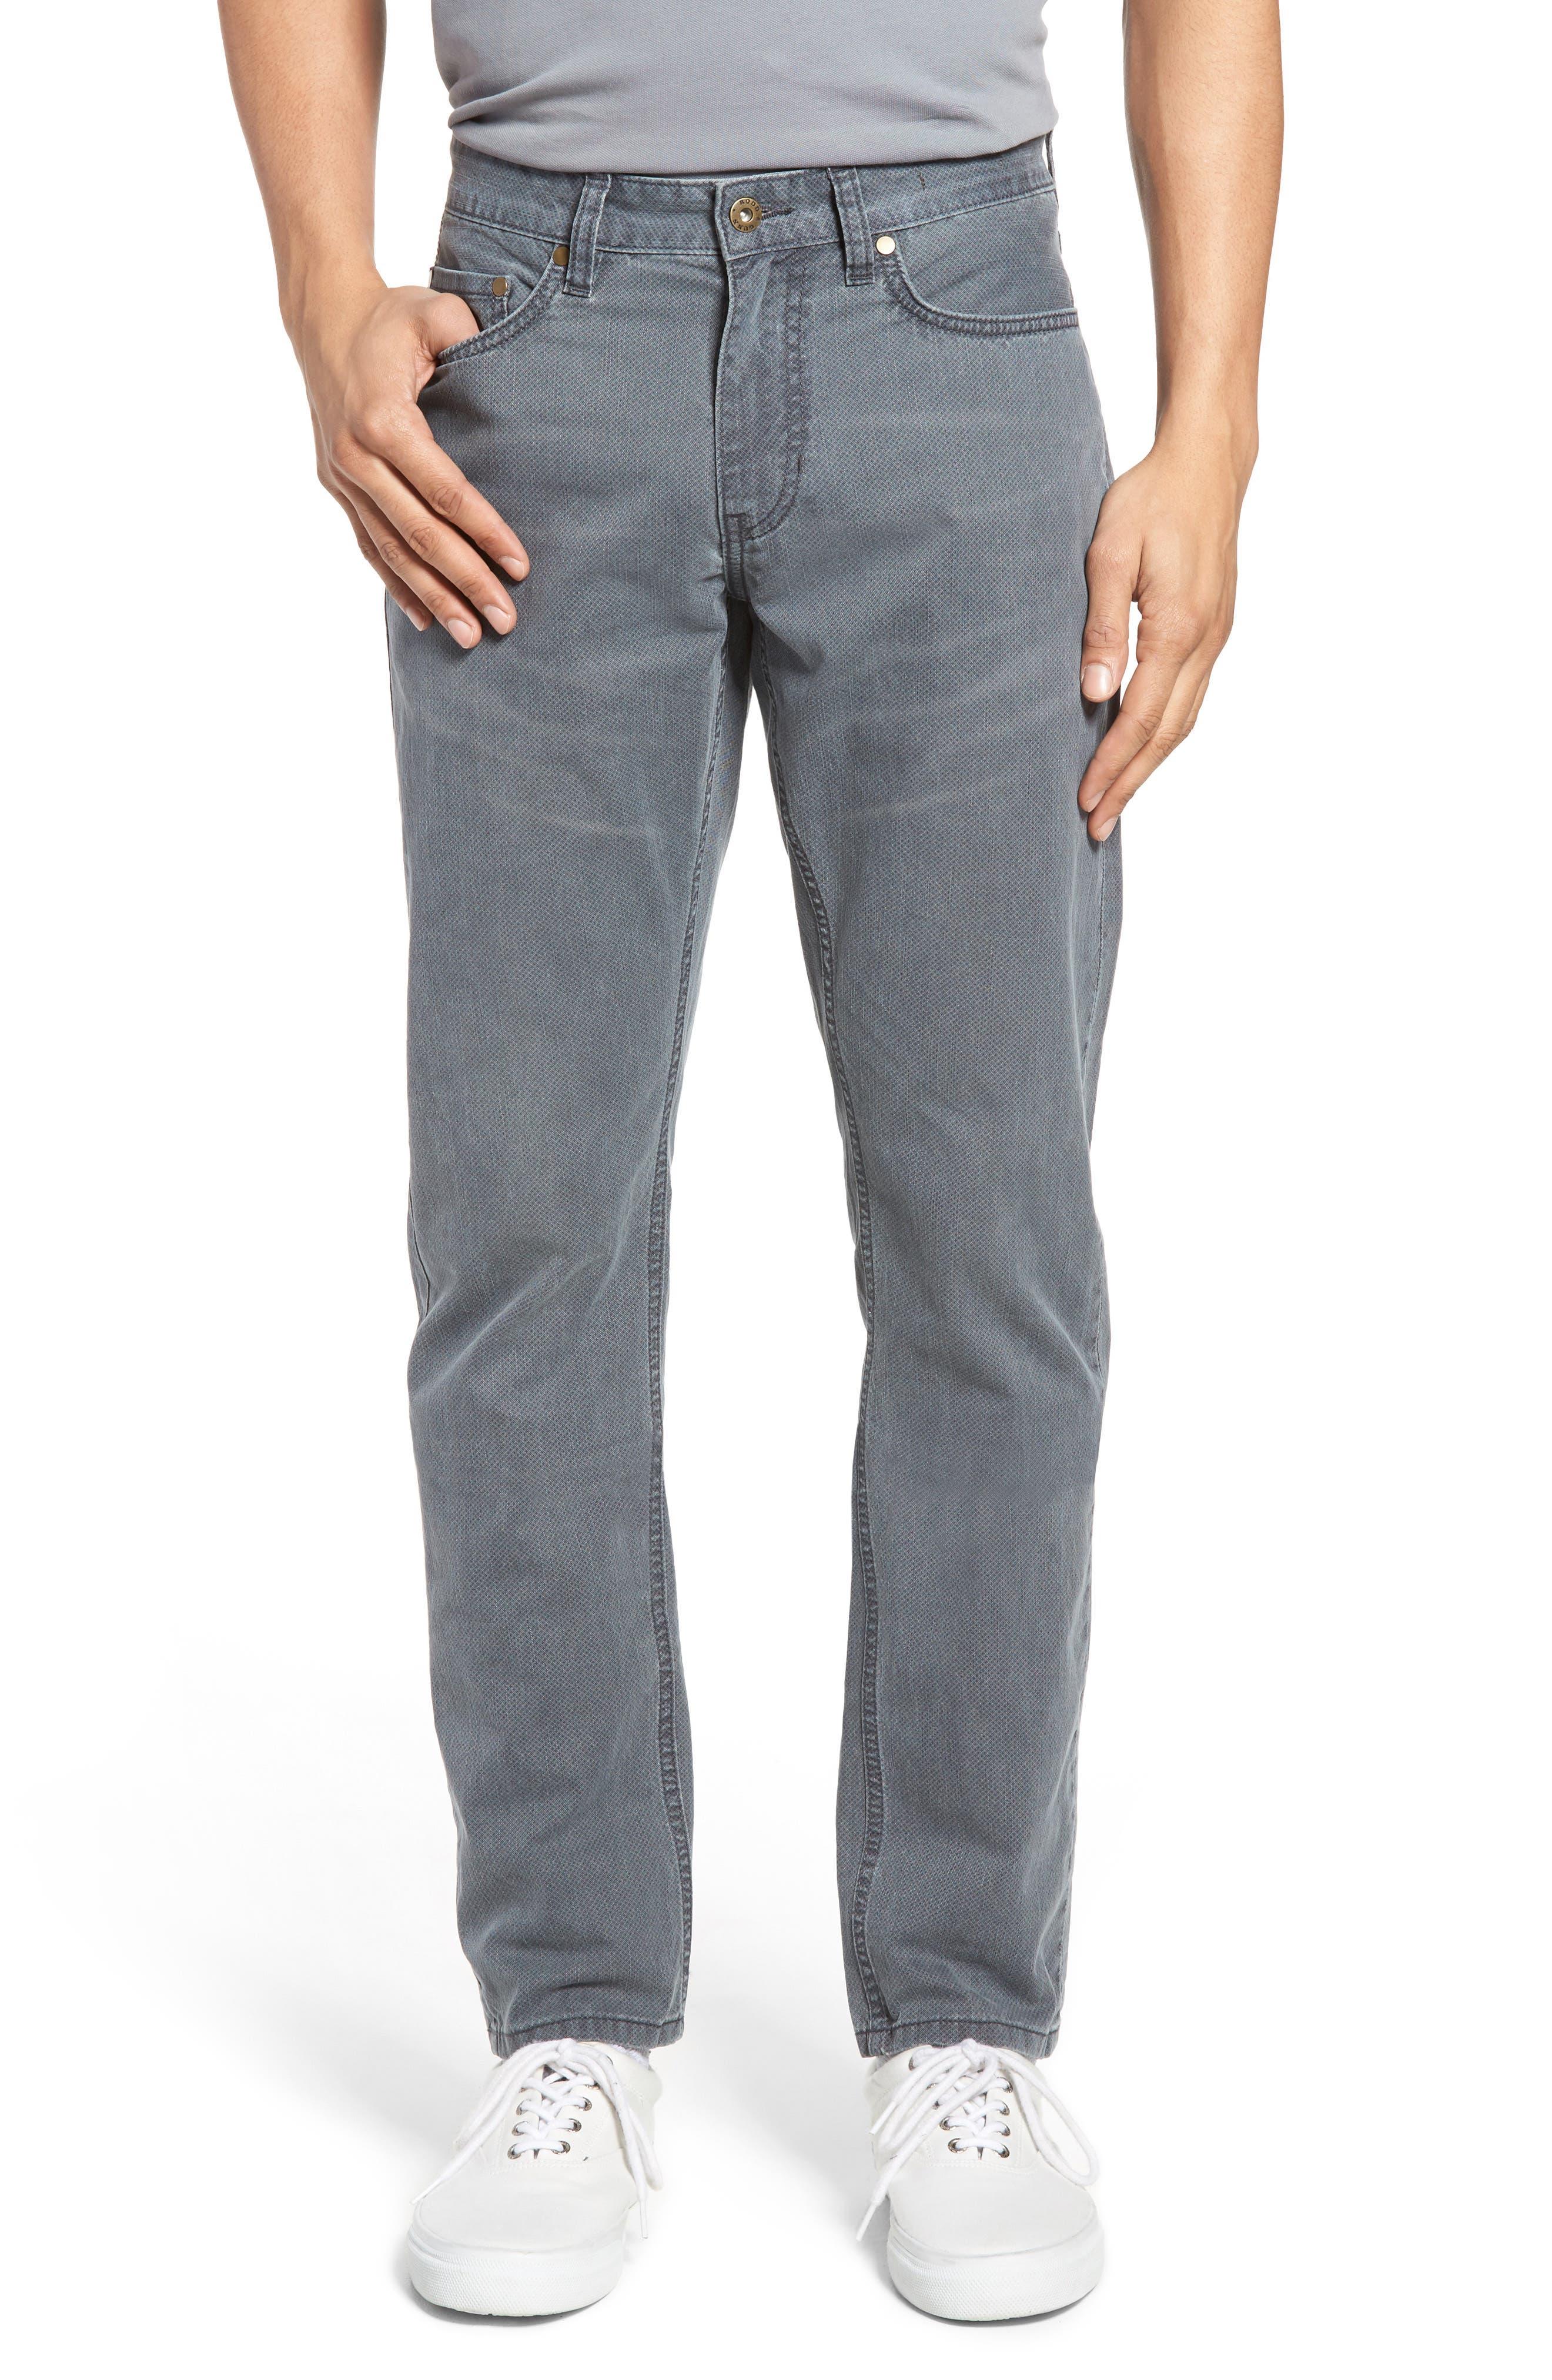 Landsborough Straight Leg Jeans,                             Main thumbnail 1, color,                             069